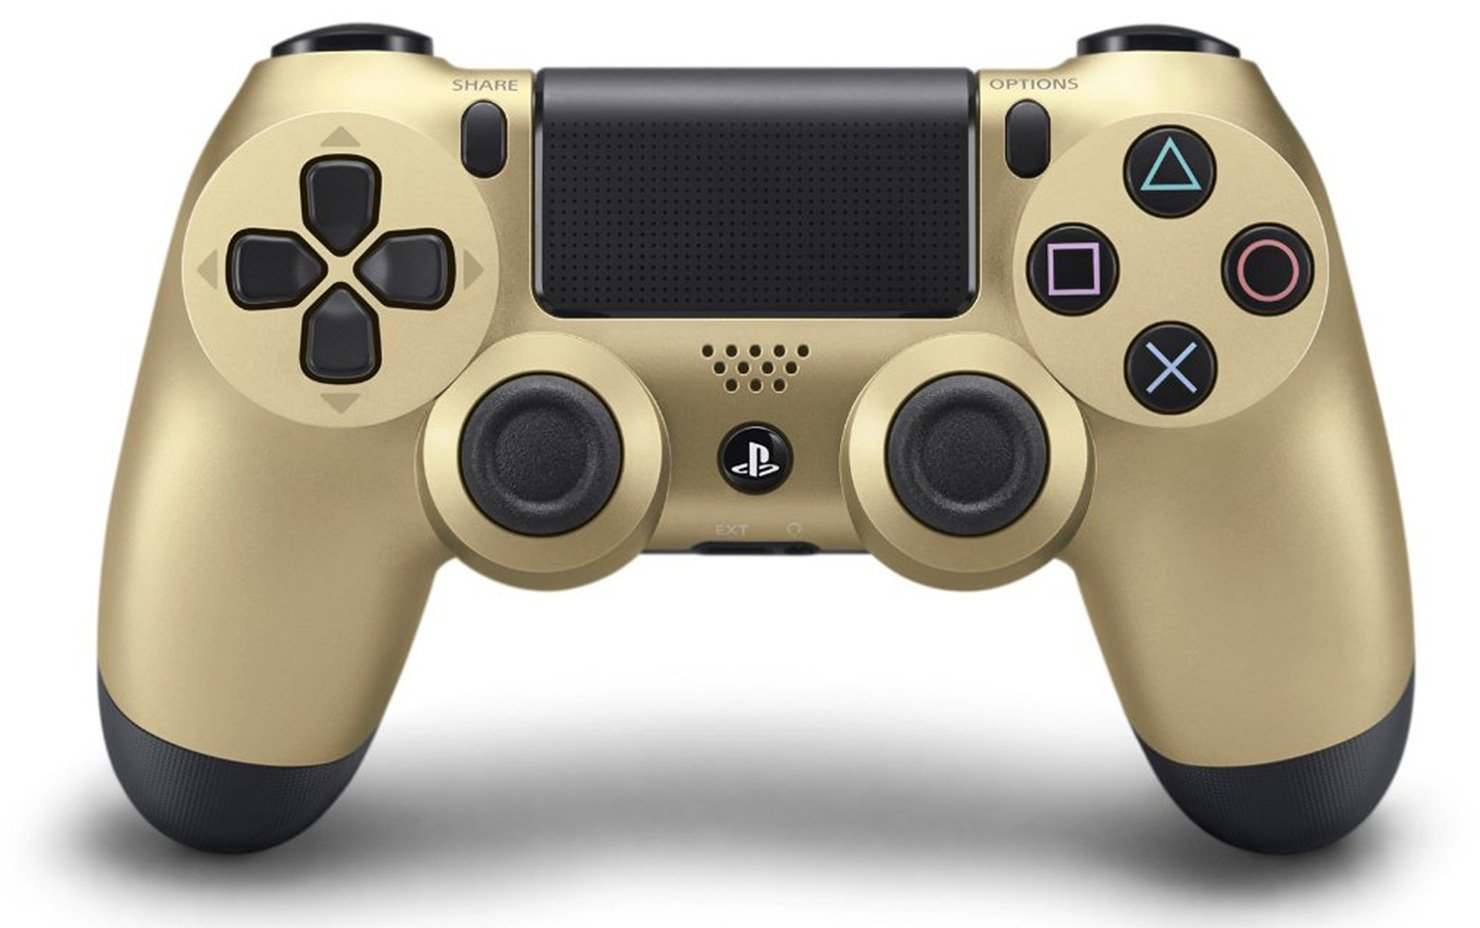 Геймпад беспроводной Sony Dualshock 4 [PS4] (Gold)